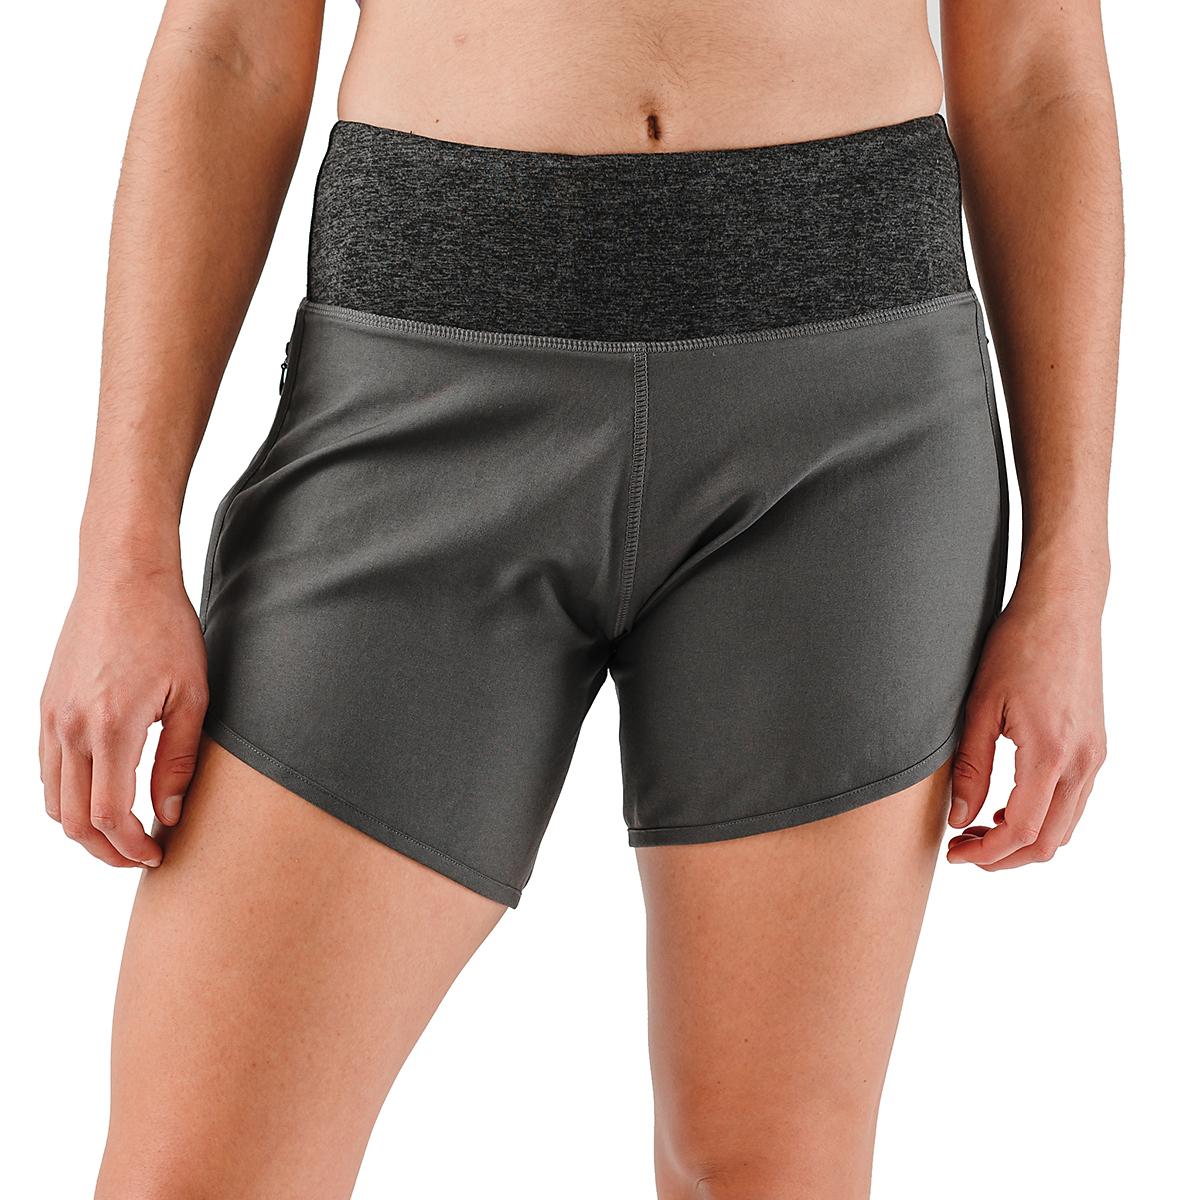 "Women's Rabbit Pocket 6"" Shorts - Color: Charcoal - Size: XS, Charcoal, large, image 1"